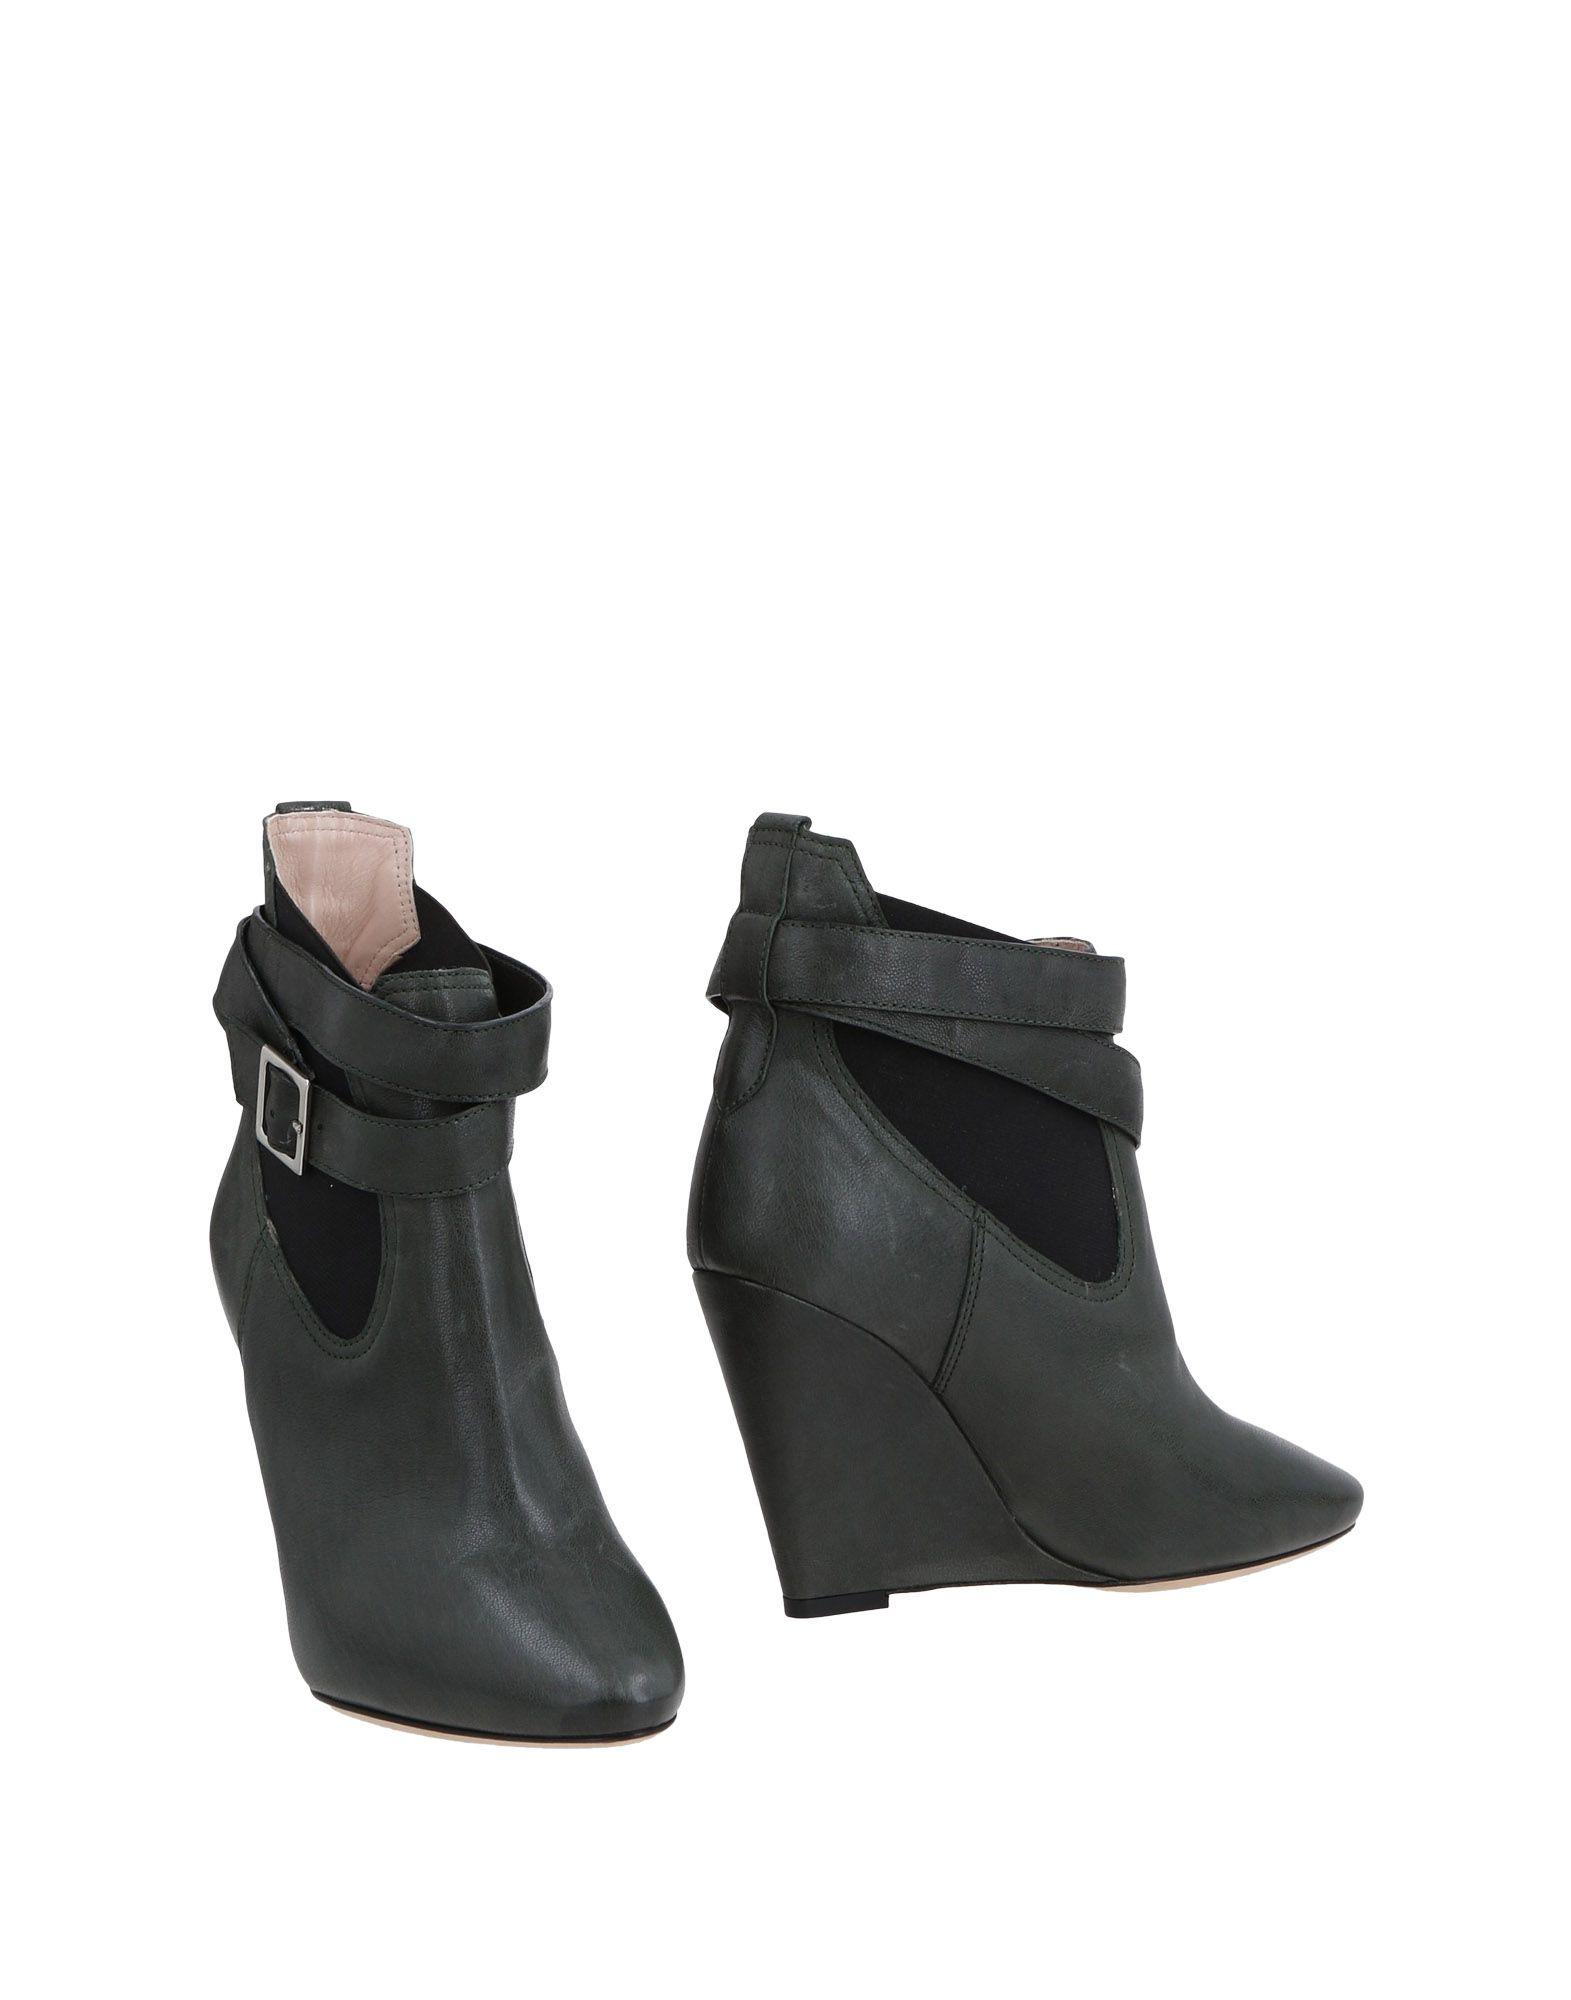 Cavallini Ankle Boot - Women on Cavallini Ankle Boots online on Women  Australia - 11484219PF f78492